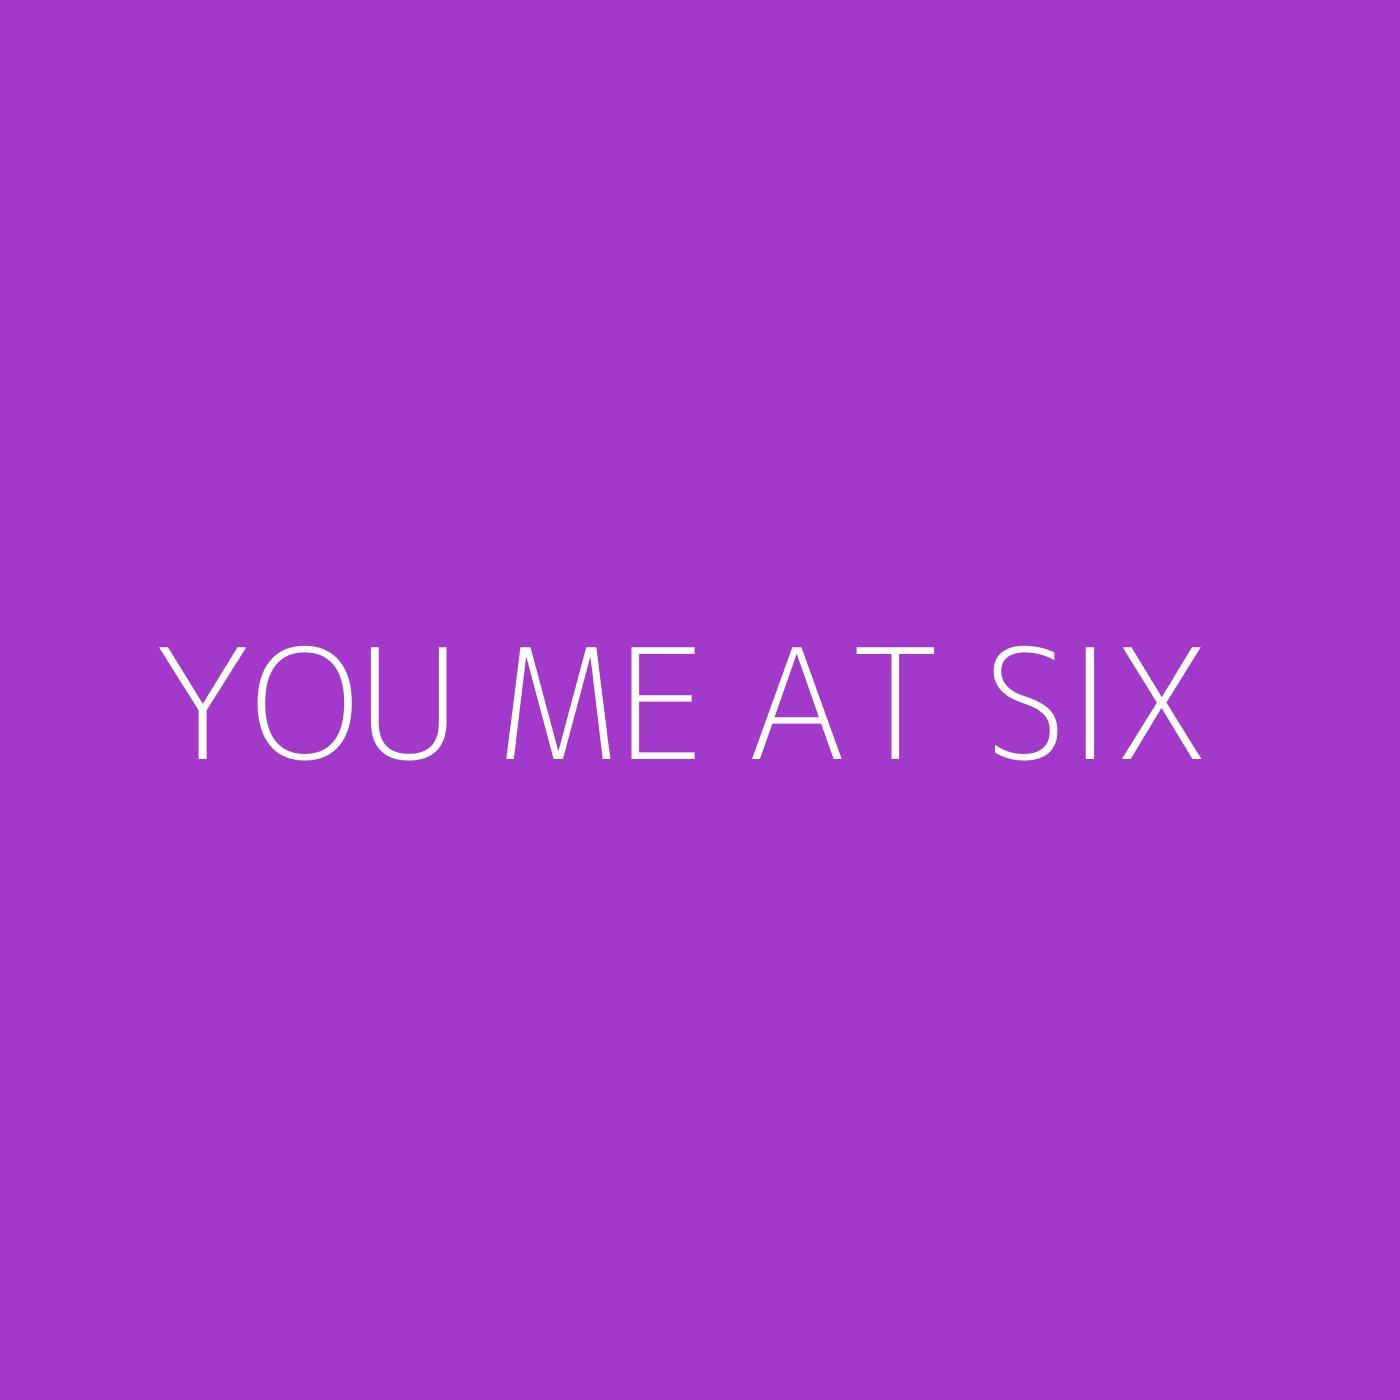 You Me At Six Playlist Artwork